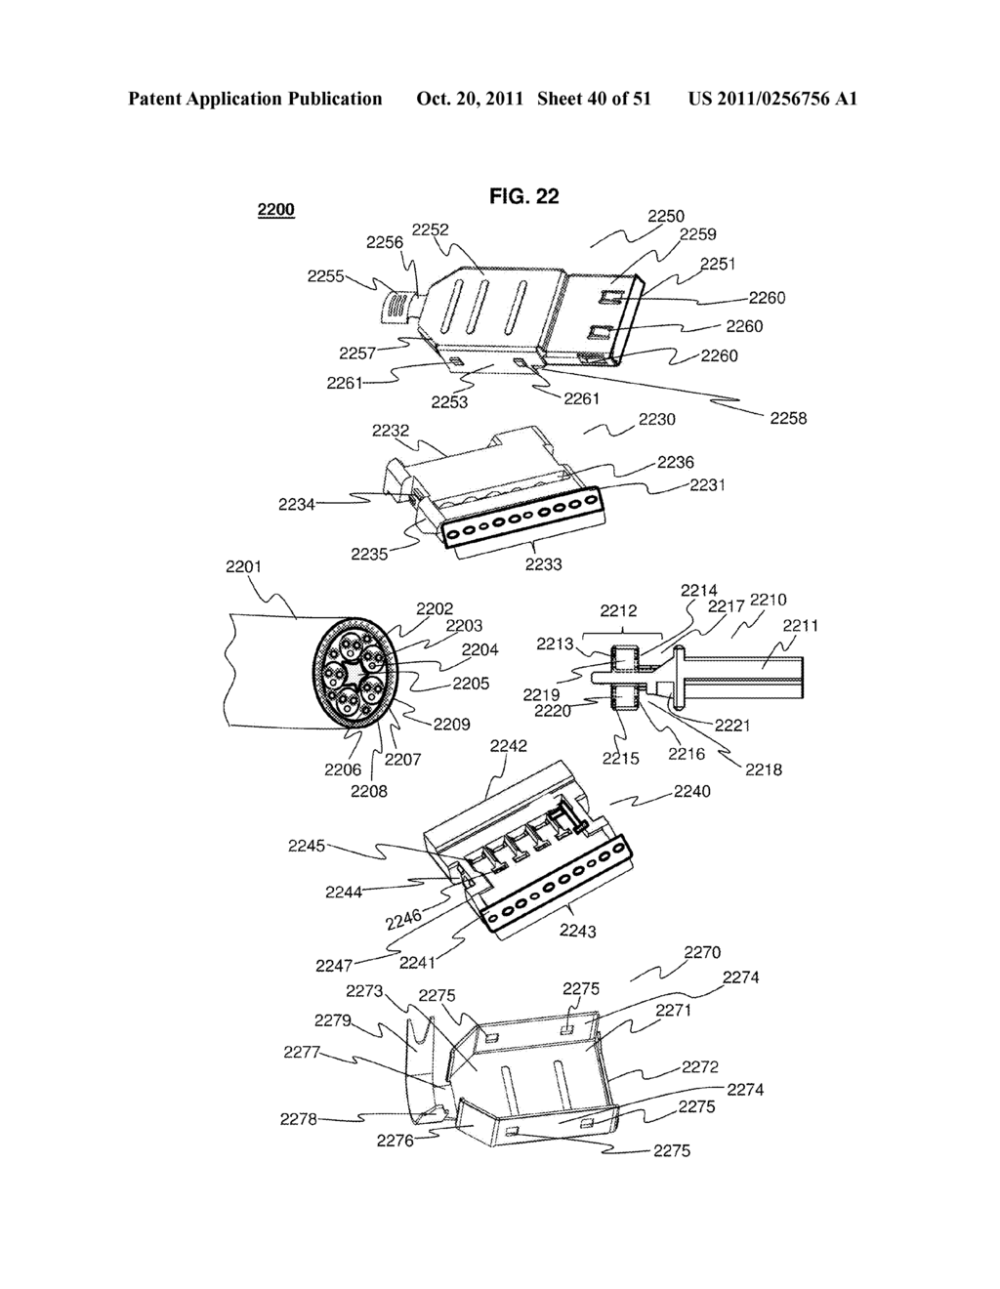 medium resolution of diiva displayport dvi usb and hdmi diy field termination products diagram schematic and image 41